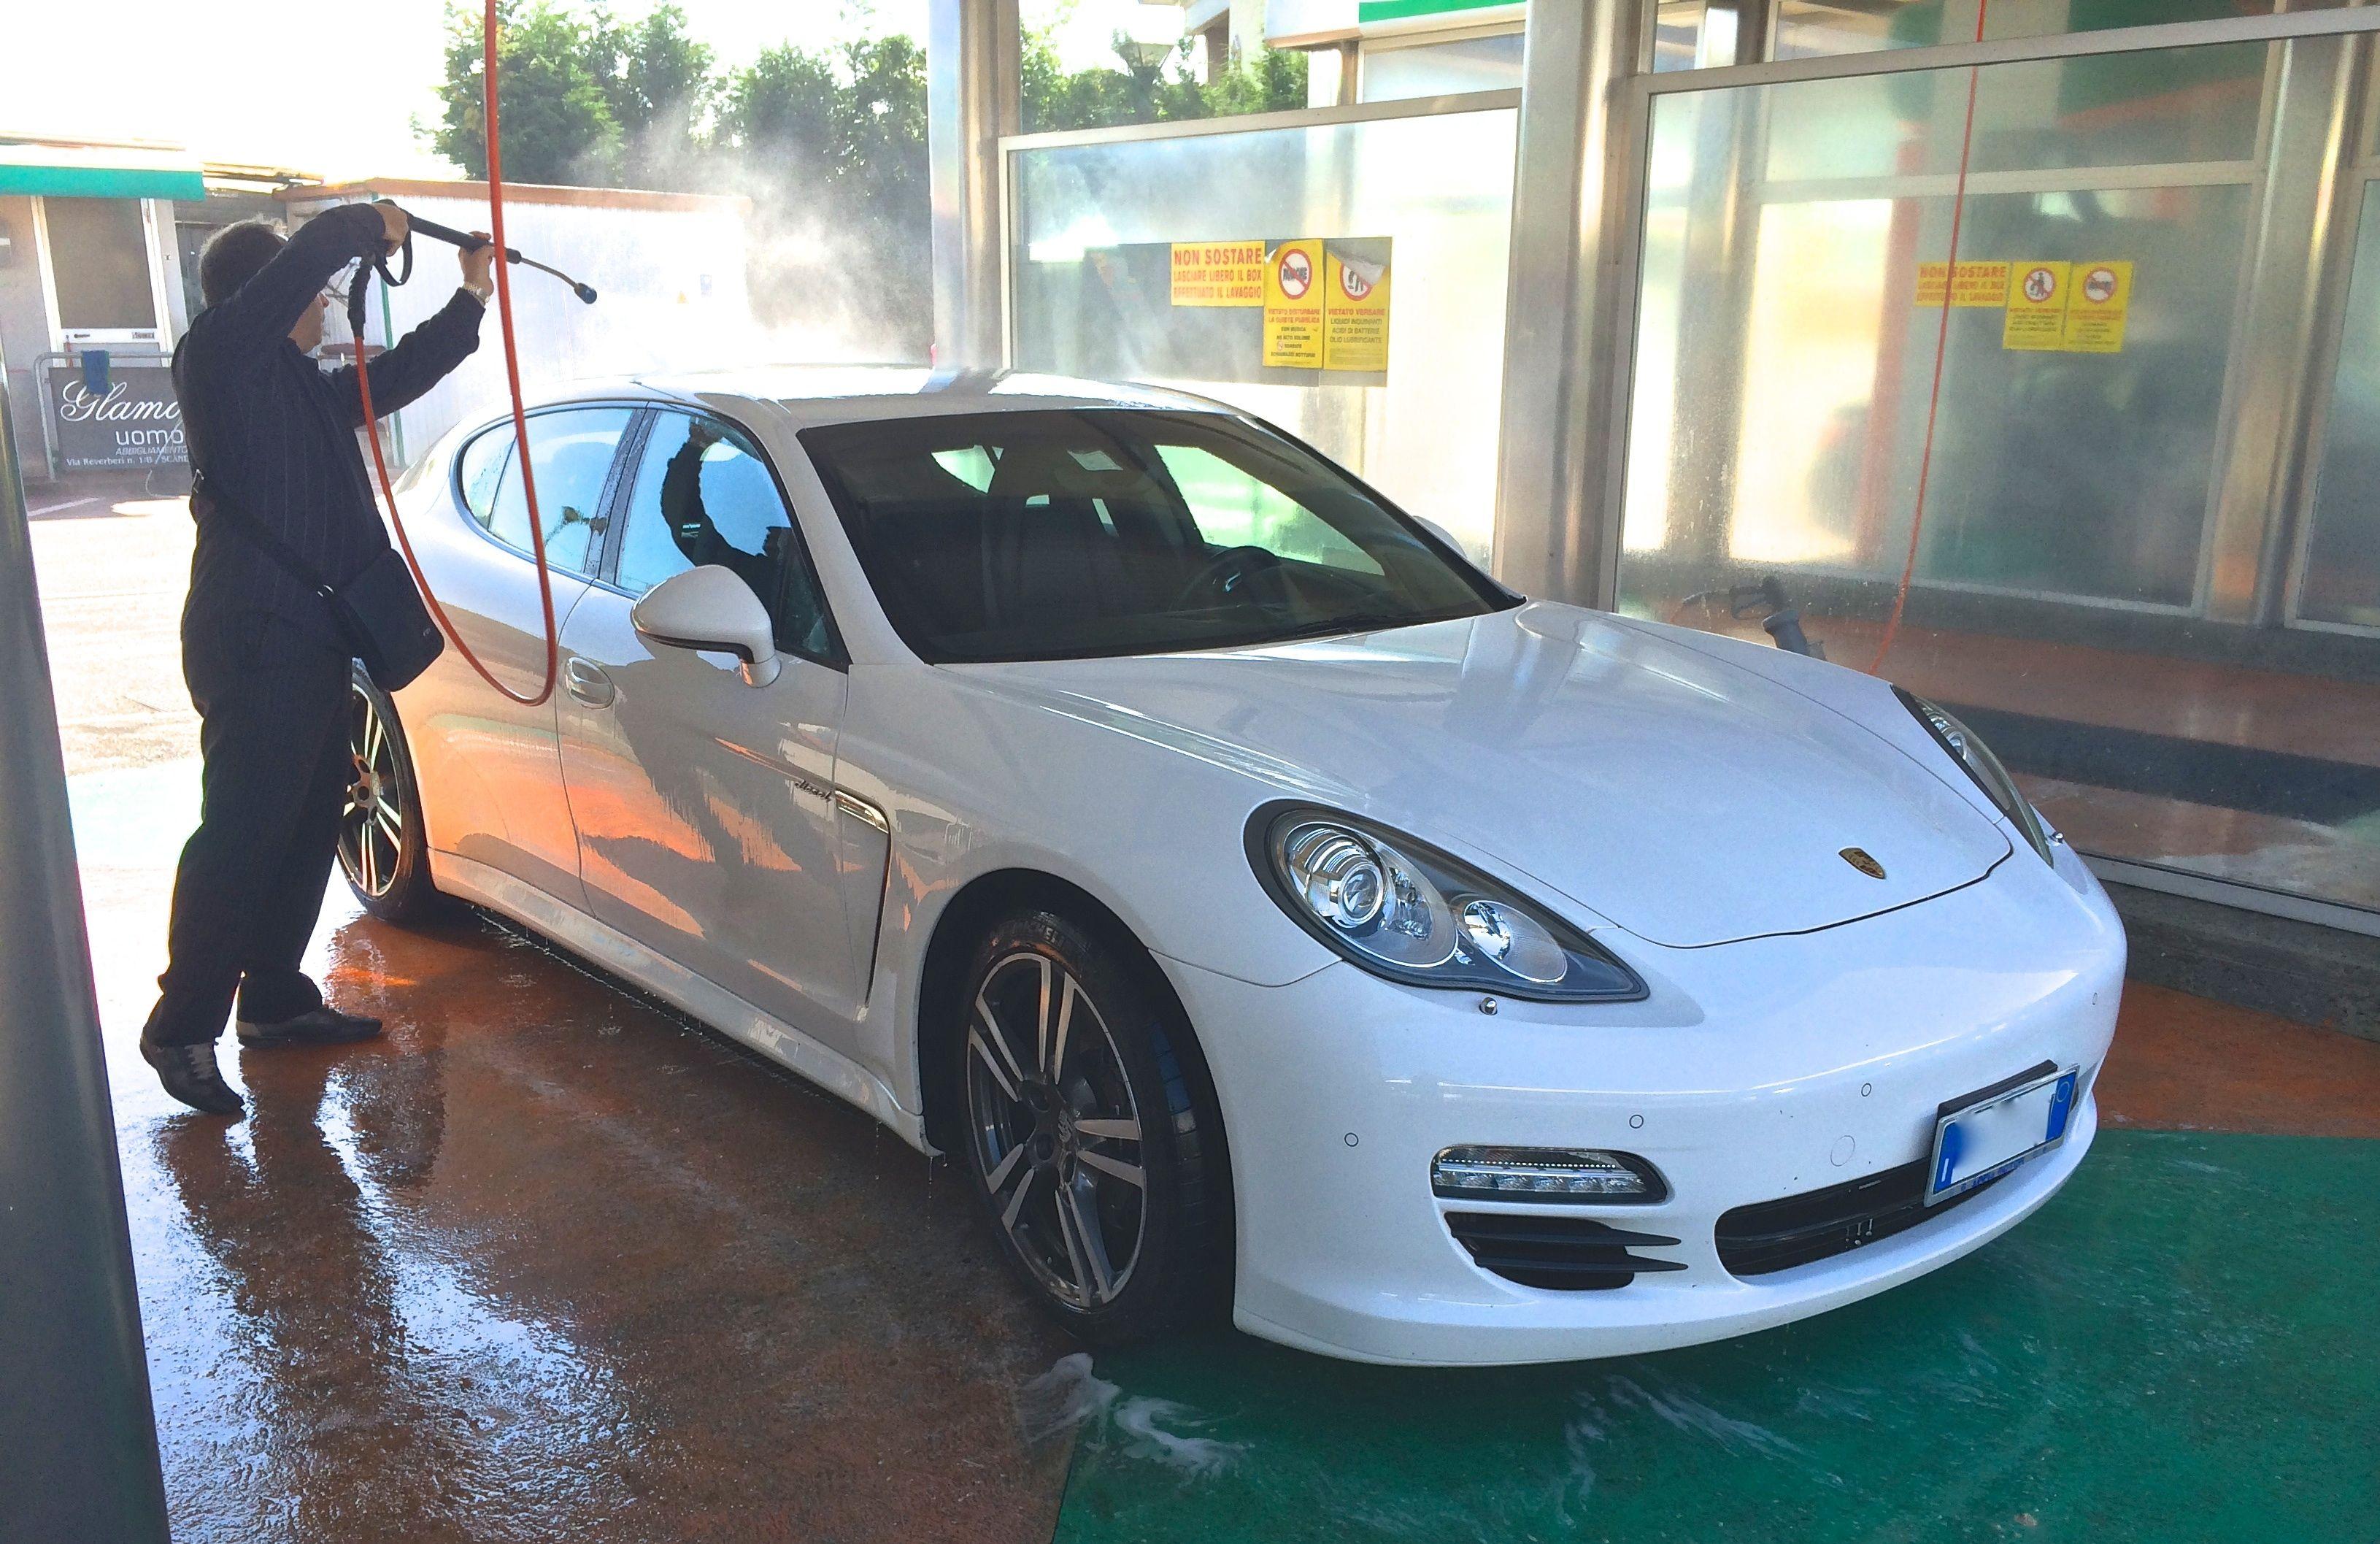 Panamera D Porsche CarWash SelfService